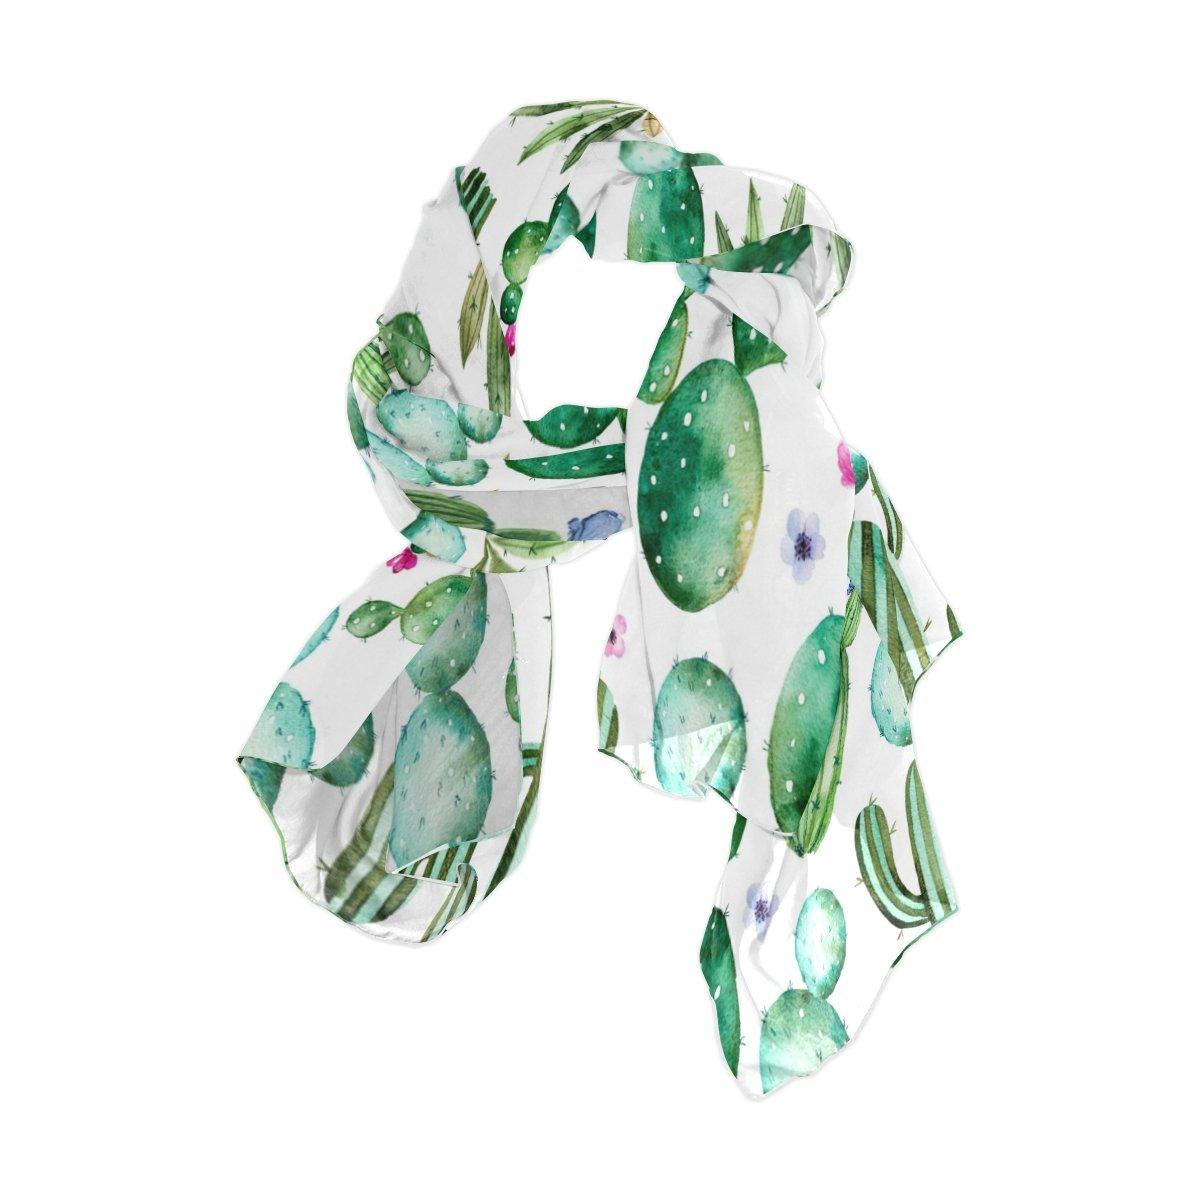 Use4 Fashion Lightweight Chiffon Silk Long Scarf Shawl Wrap g4832390p110c124s164